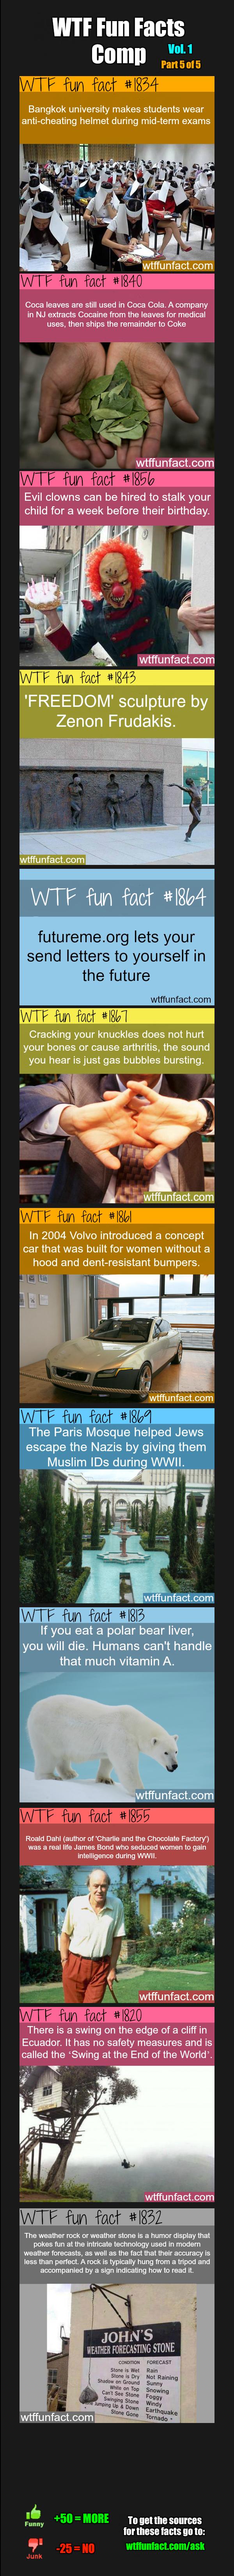 WTF Fun Fun Facts Comp Vol. 1 Part 5. Vol. 1: -WTF Fun Facts Comp Vol.1 Part 1: www.funnyjunk.com/WTF+Fun+Facts+Comp+Vol.+1+Part+1/funny-pictures/5012851/ -WTF  wtf fun facts